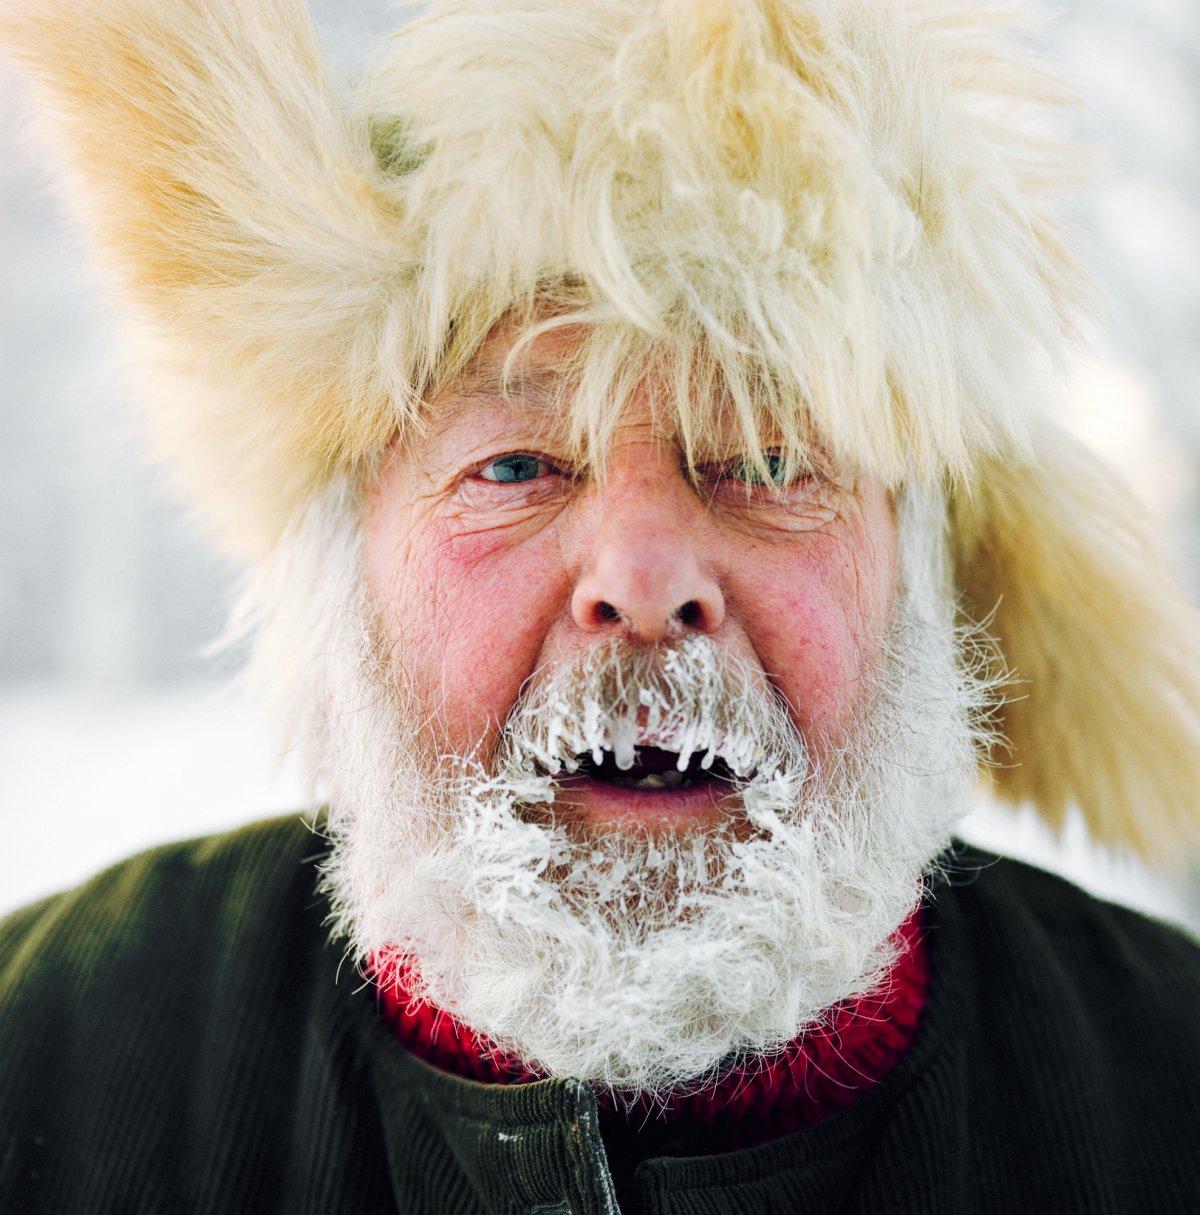 Conhe�a 15 pessoas que desafiam temperaturas extremas para viver no c�rculo �rtico